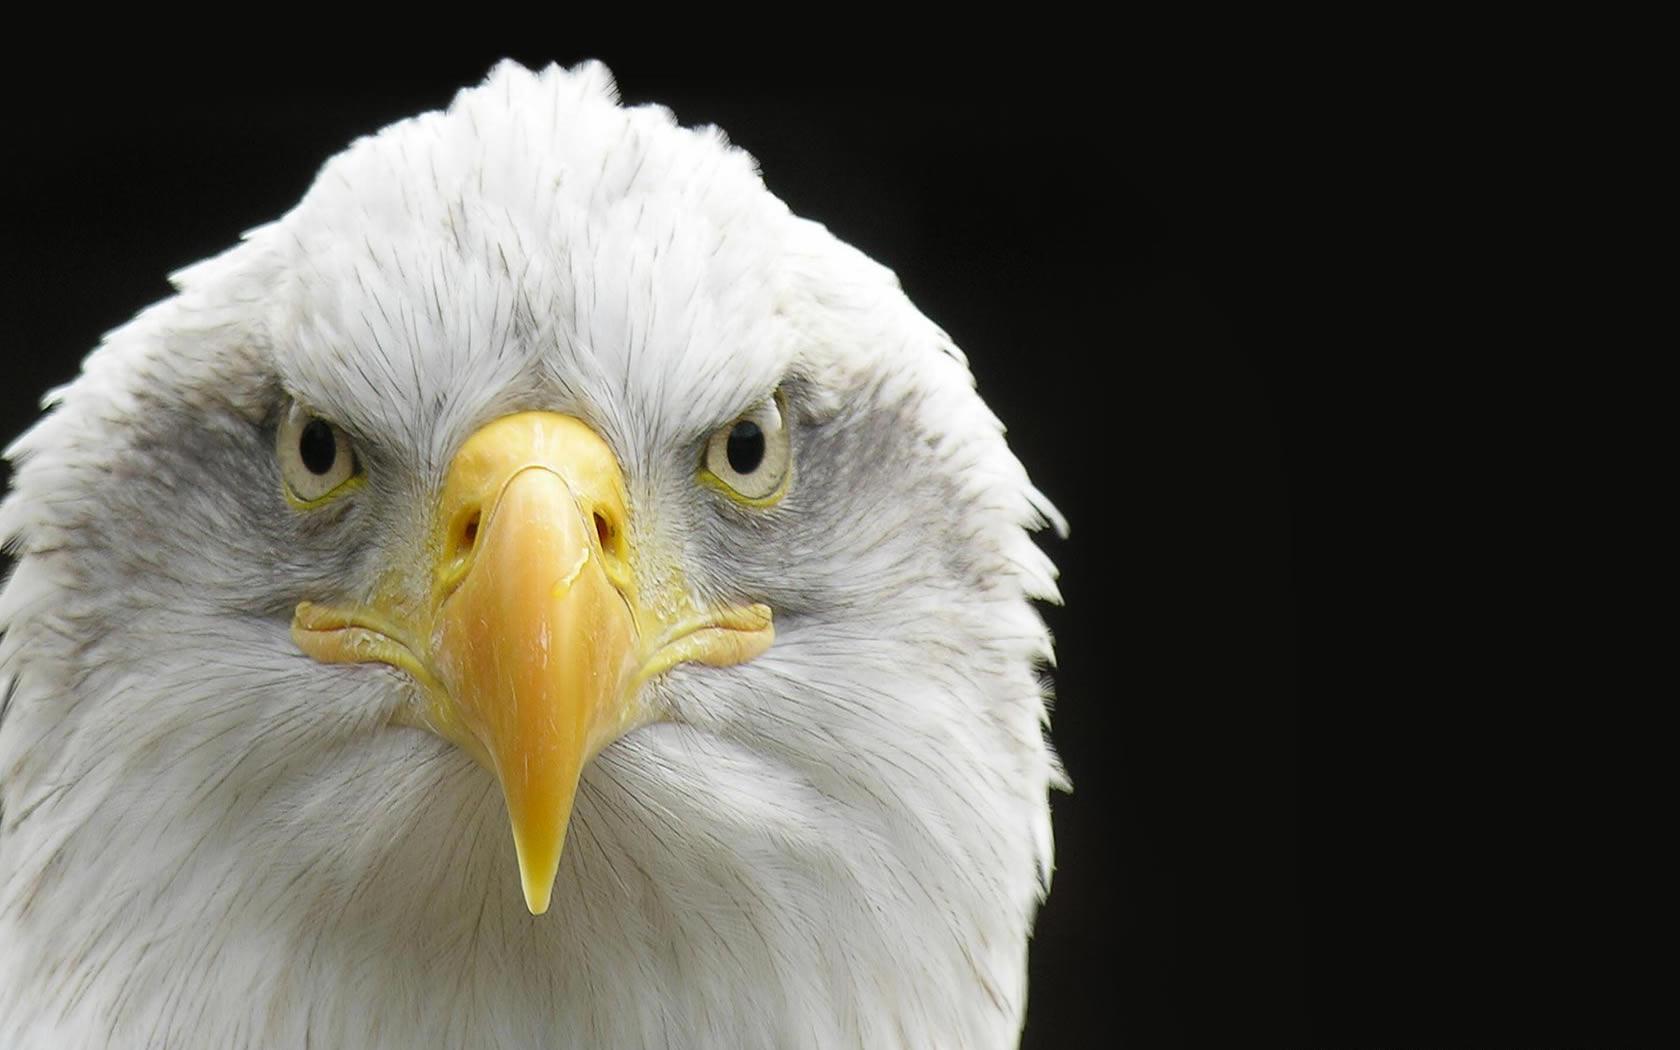 Bald Eagle Eyeing The Camera